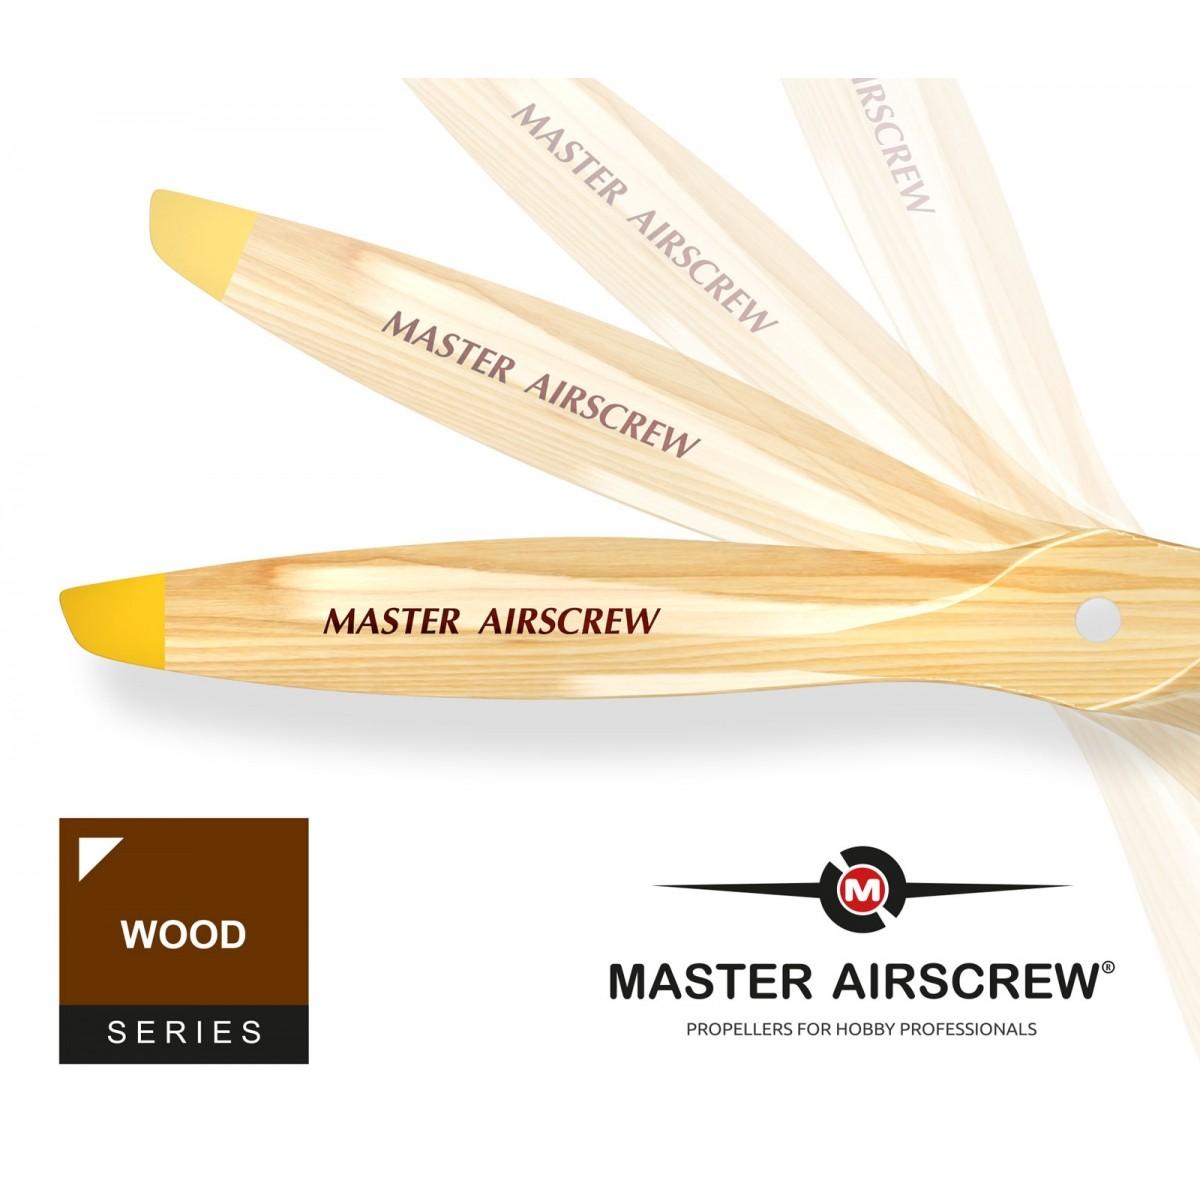 MA1080B - Hélice Master Airscrew Wood Series 10x8